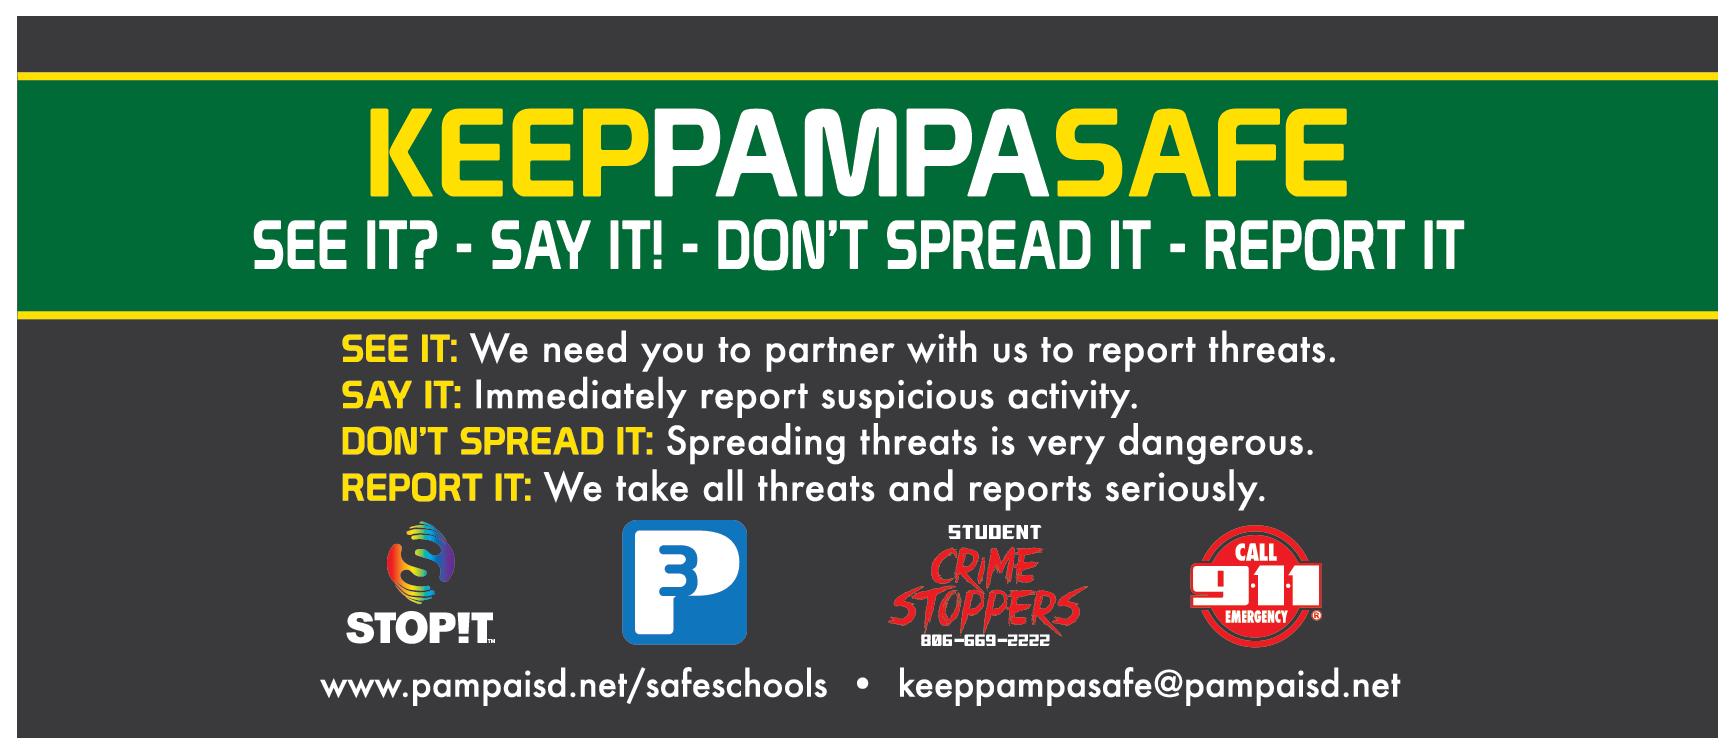 Keep Pampa Safe